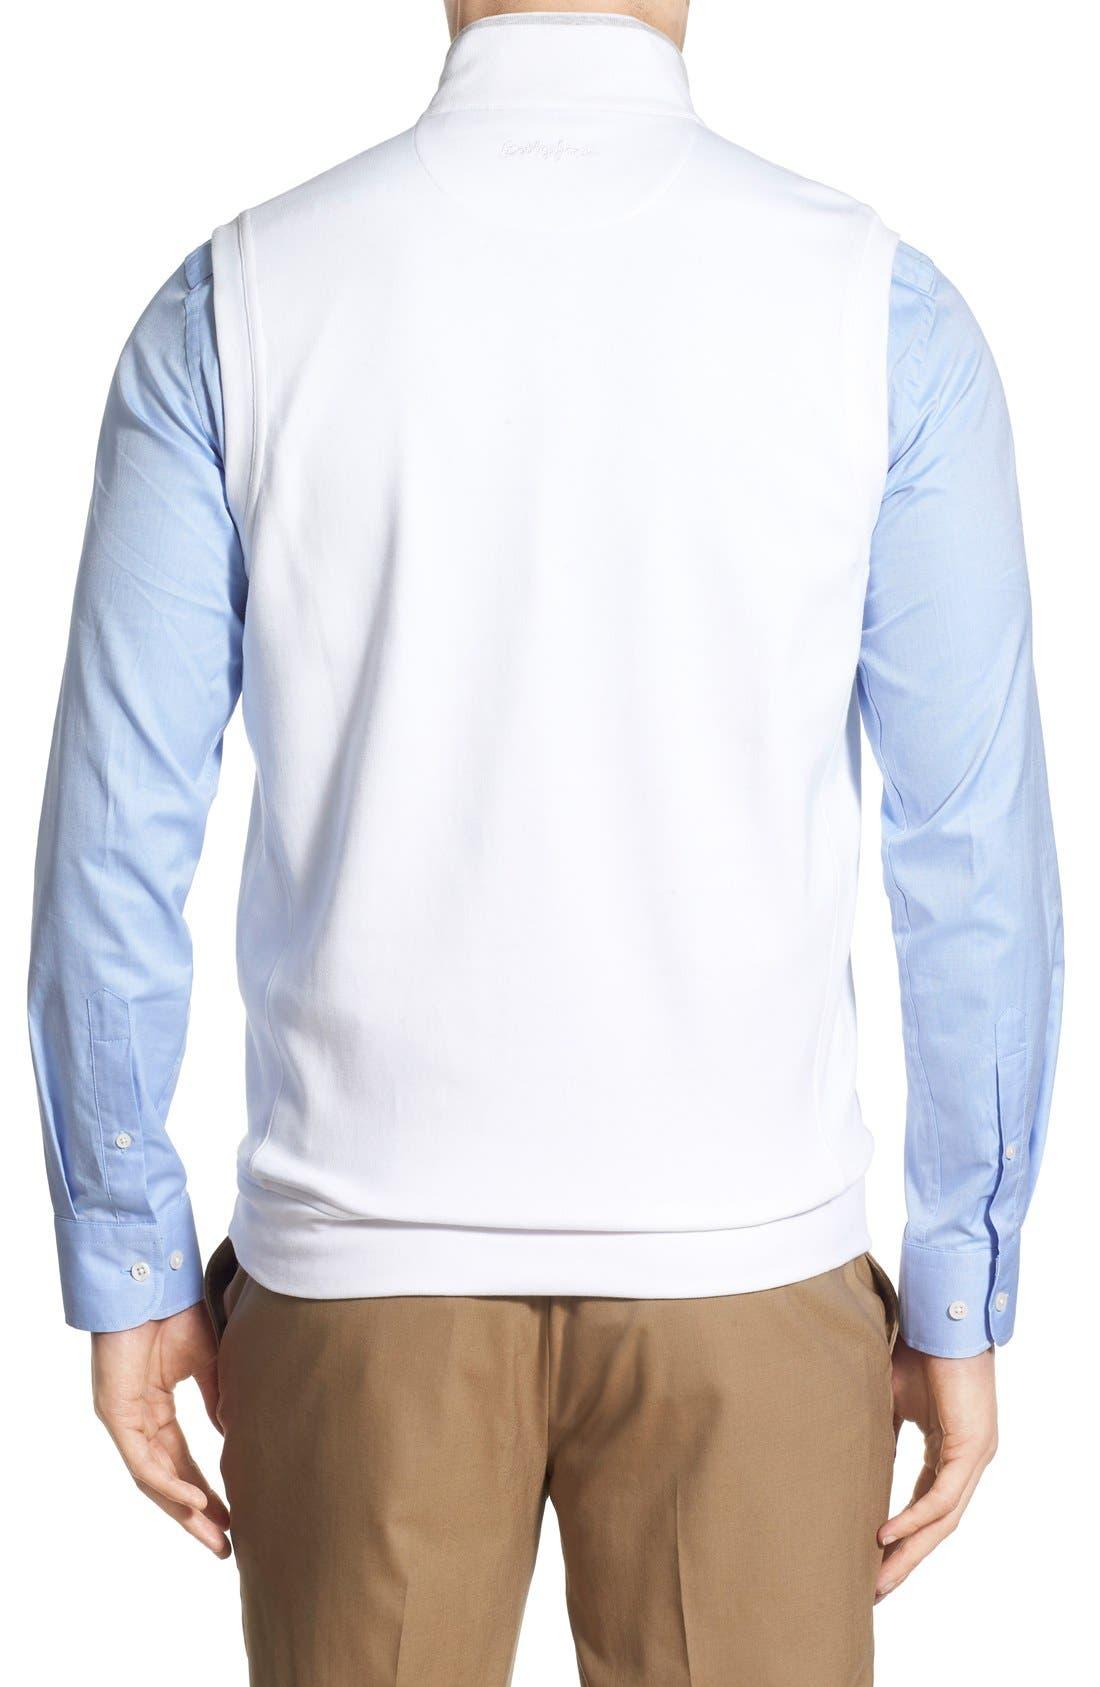 Leaderboard Quarter Zip Pima Cotton Vest,                             Alternate thumbnail 2, color,                             White